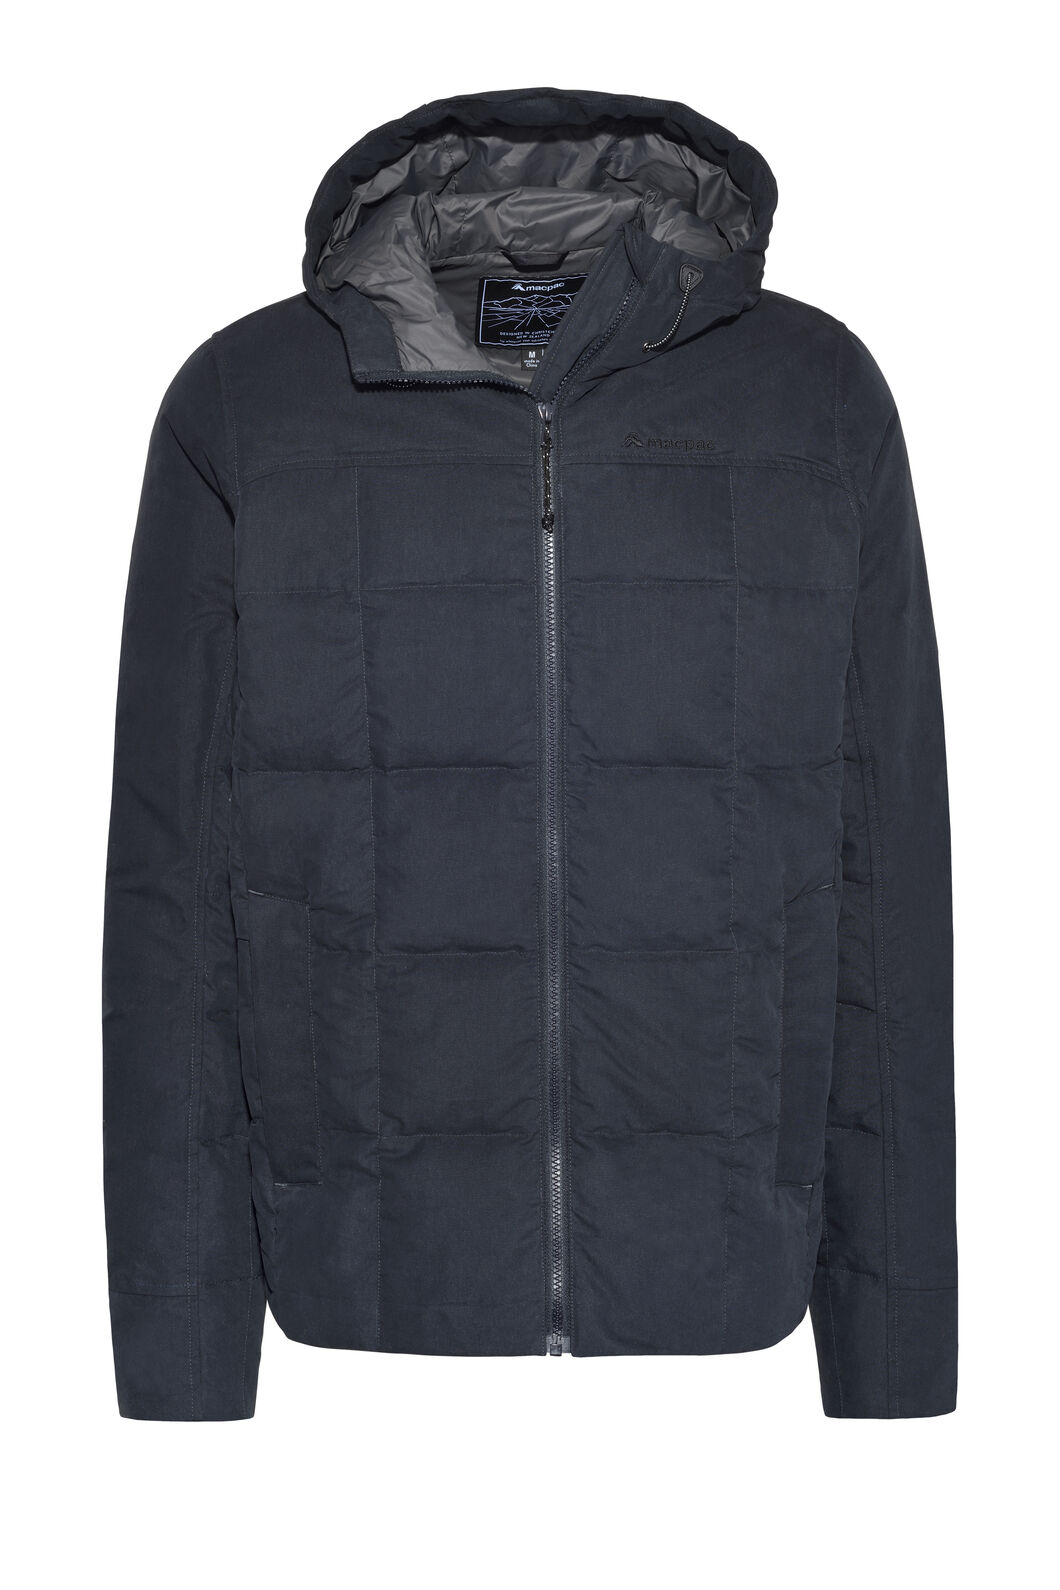 Macpac Men's Fusion Down Jacket, Carbon, hi-res